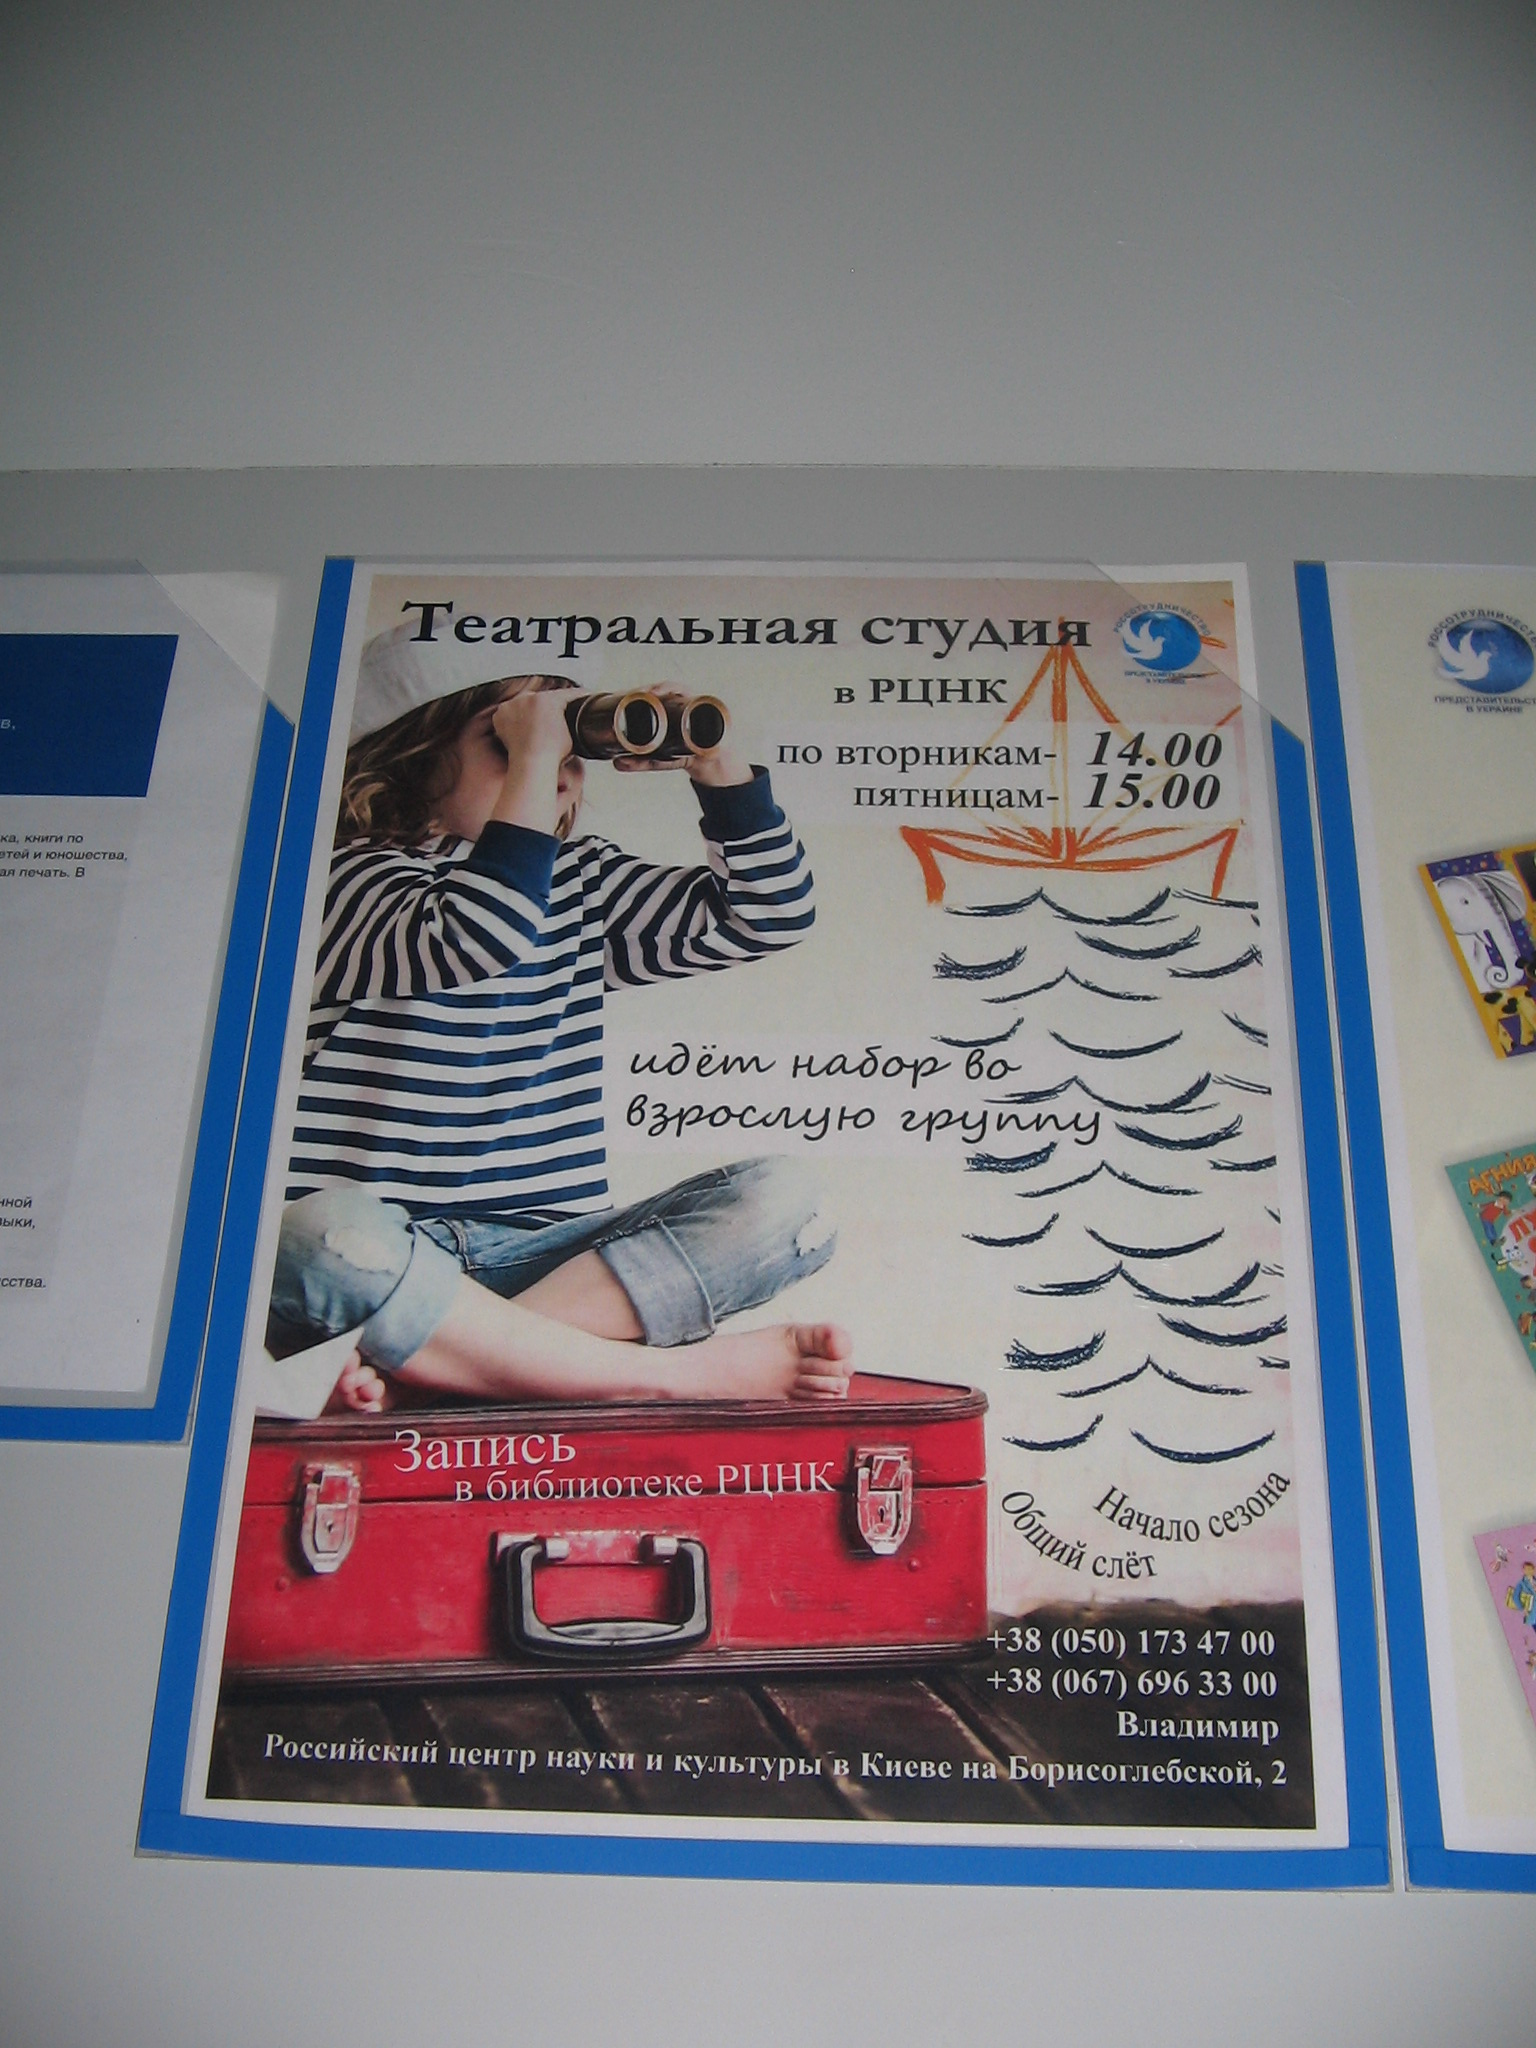 http://s7.uploads.ru/6eqAE.jpg